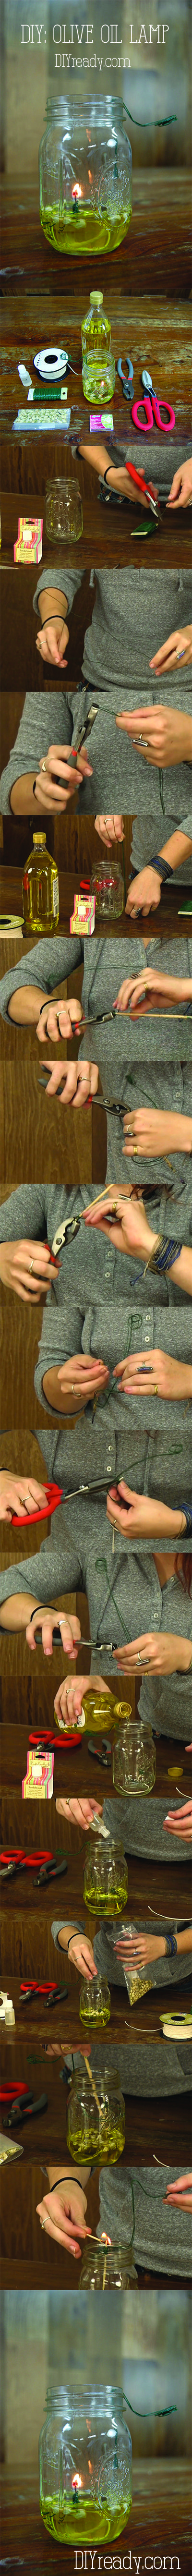 Mason Jar Ideas for Easy Mason Jar DIY Projects! Step-by-step DIY Infographics s...